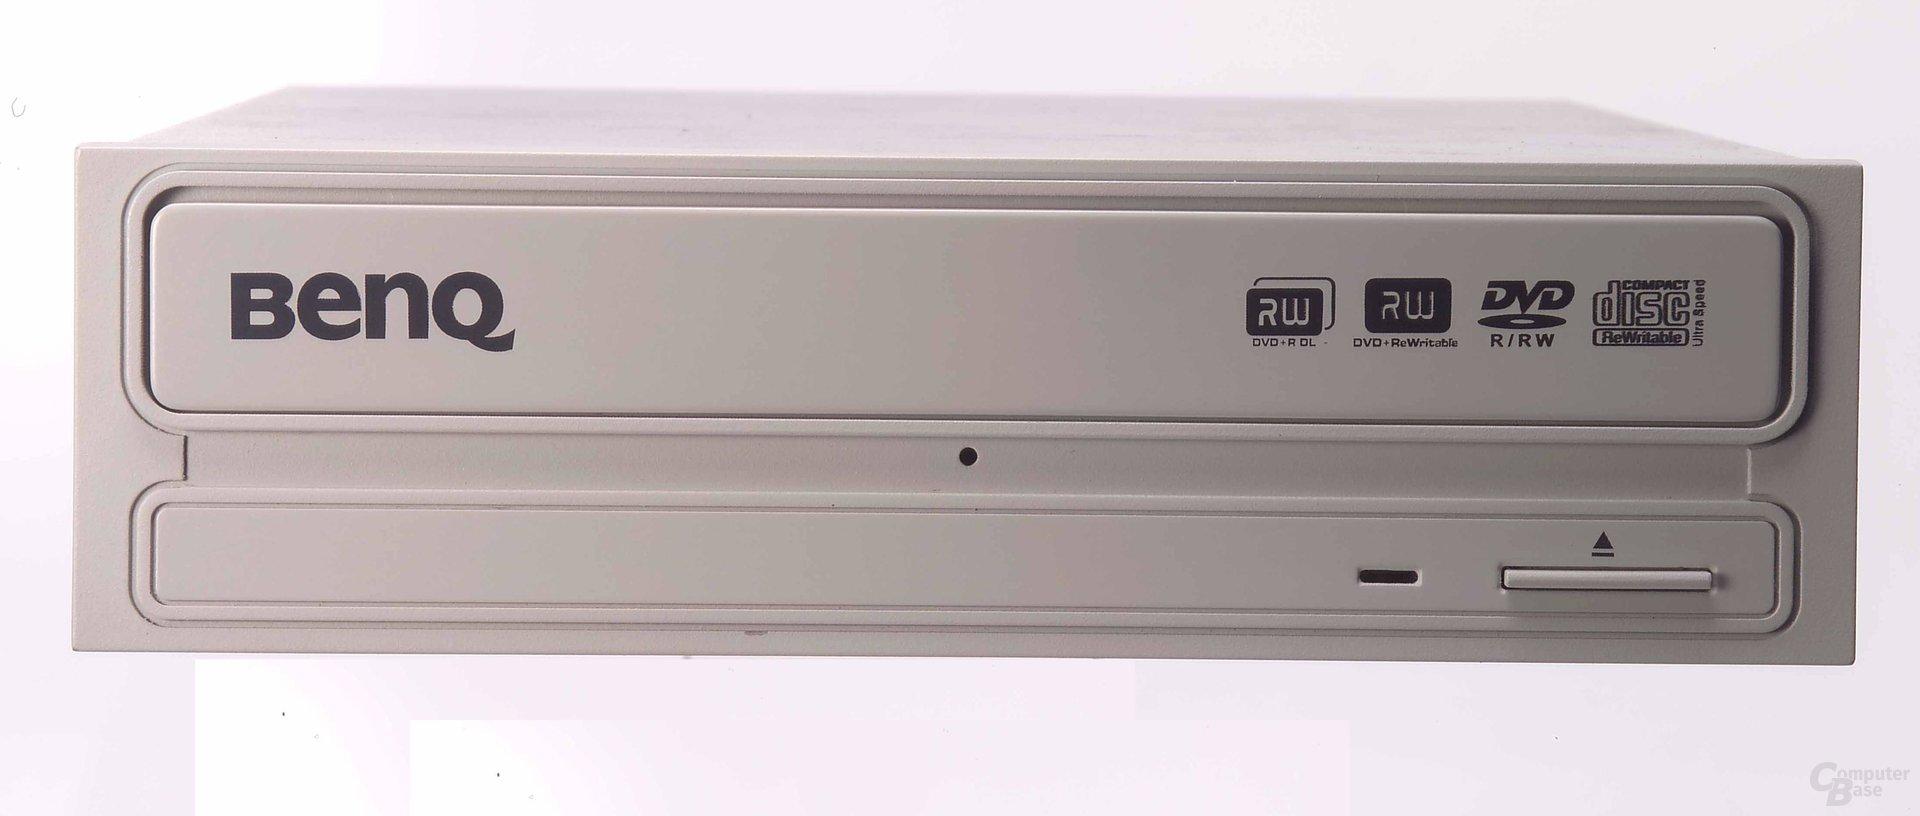 DW1620 Pro